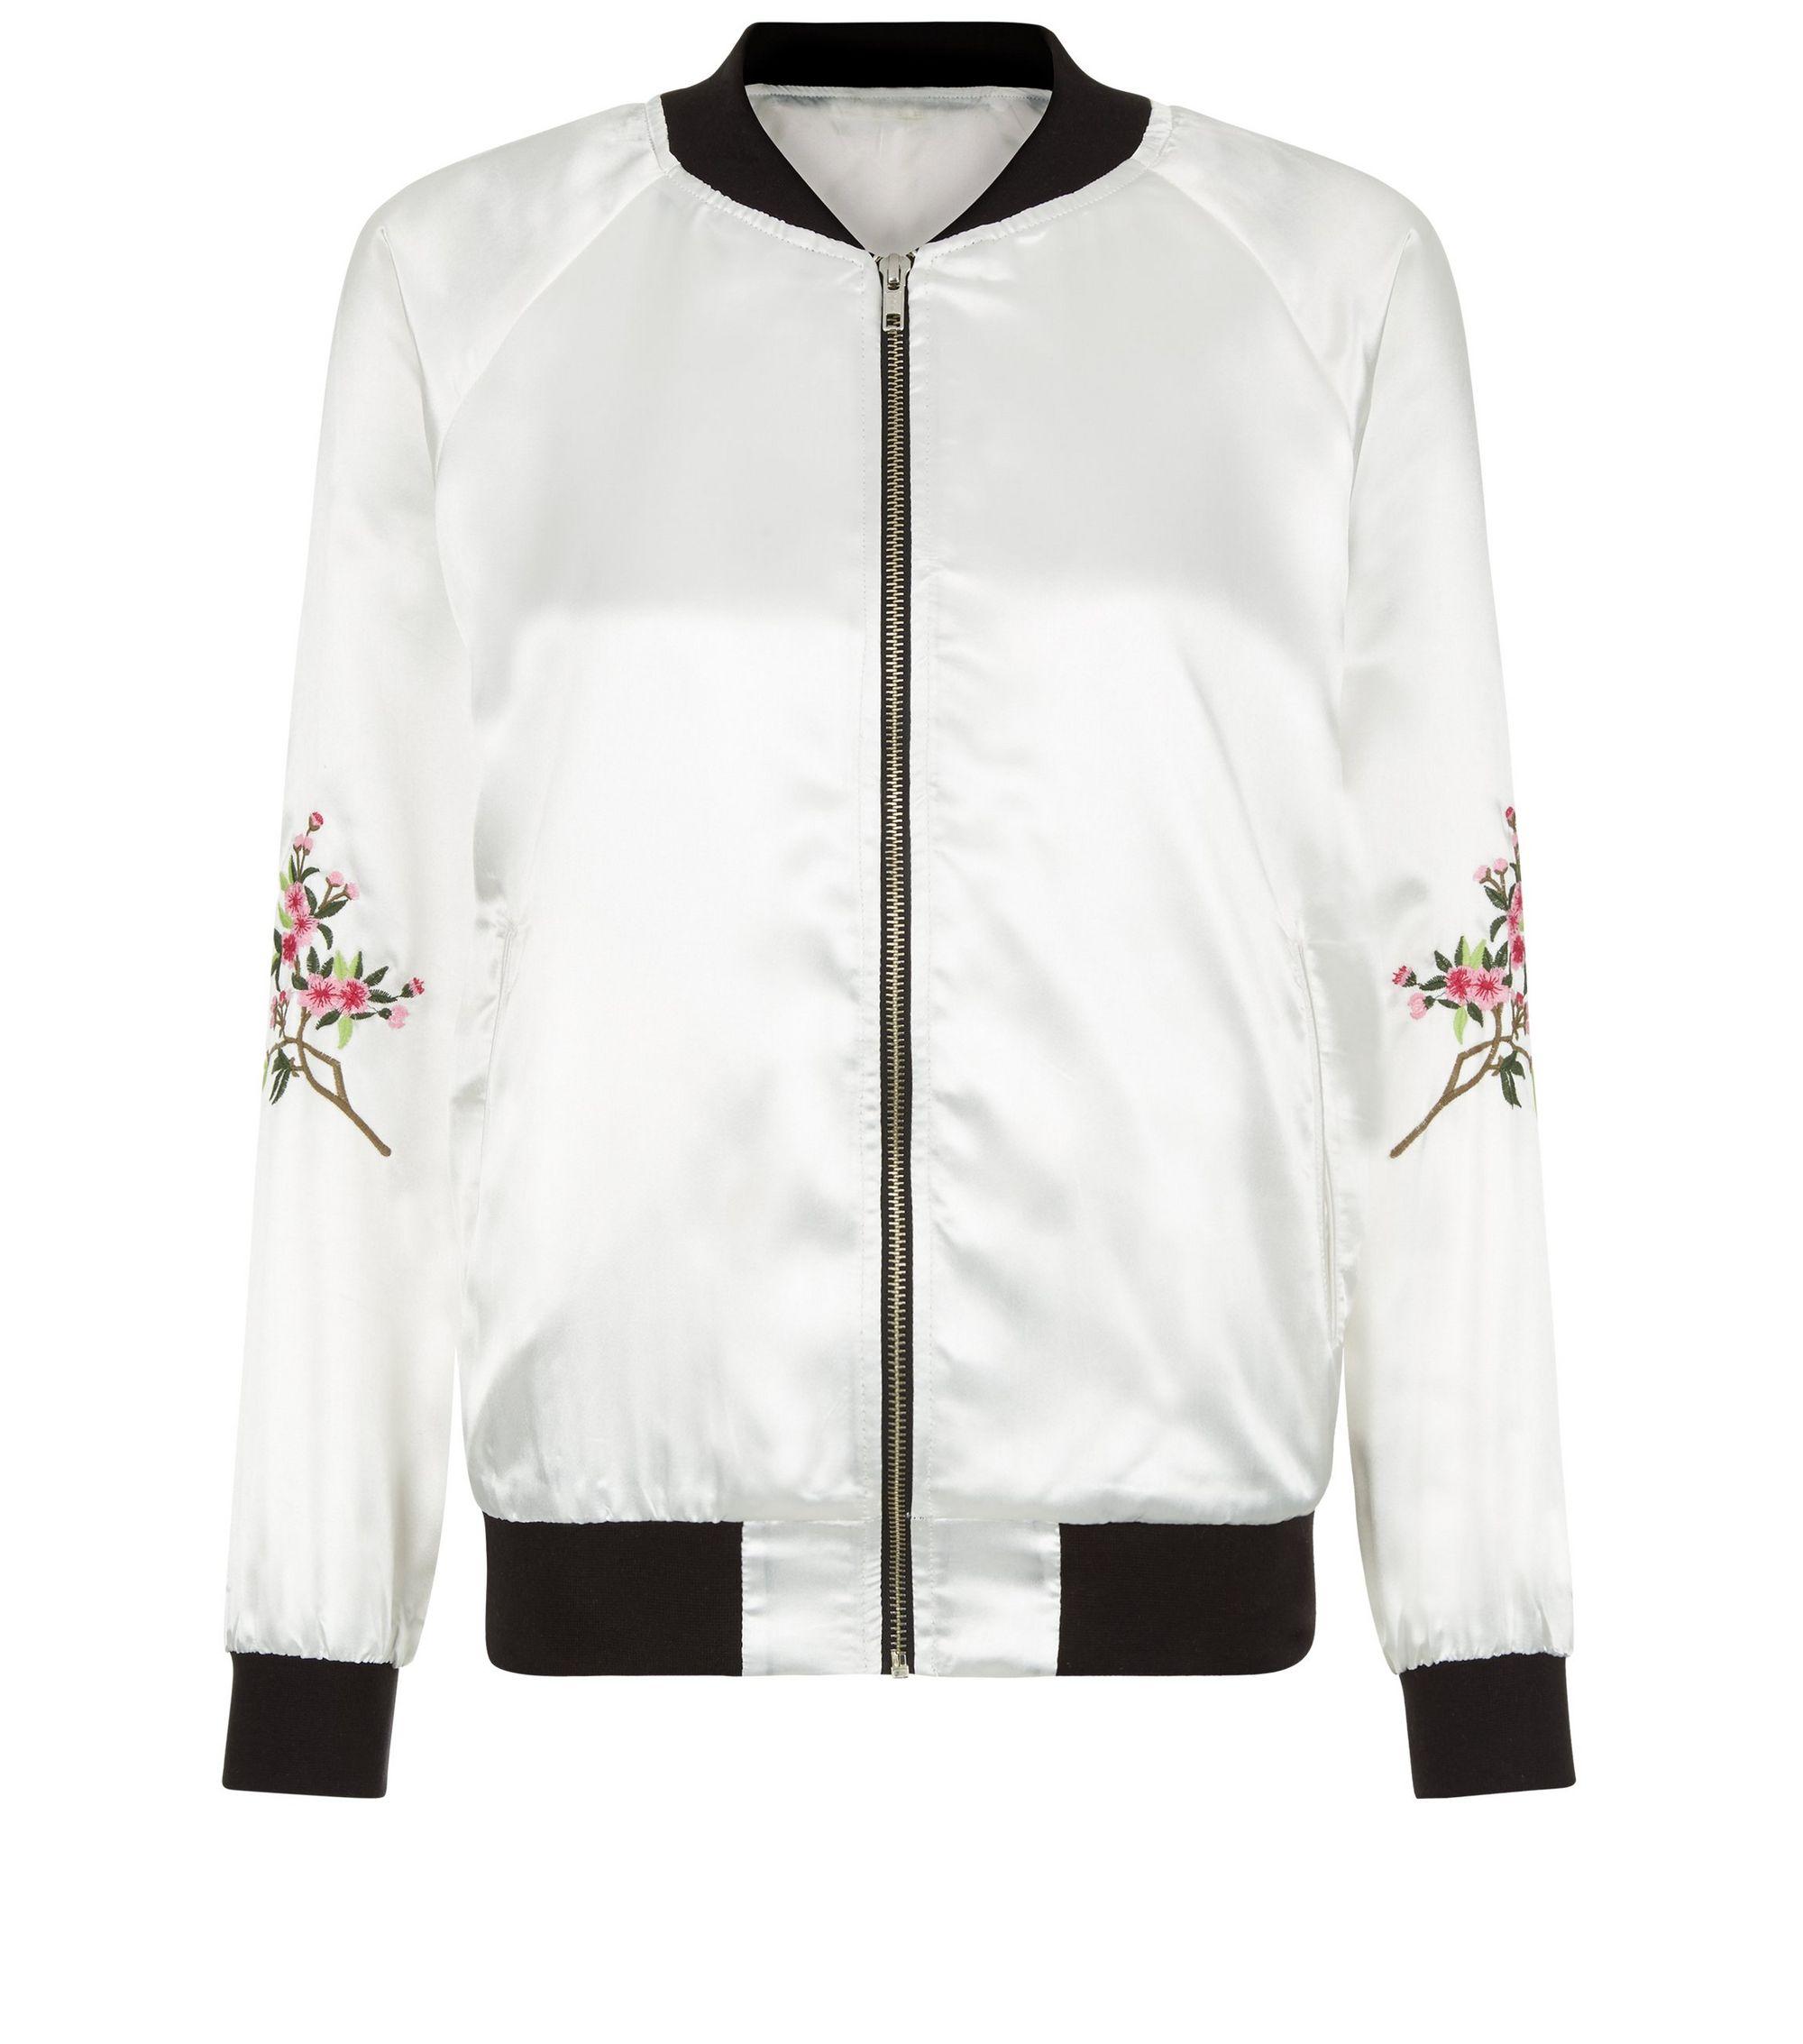 New look embroidered jacket makaroka